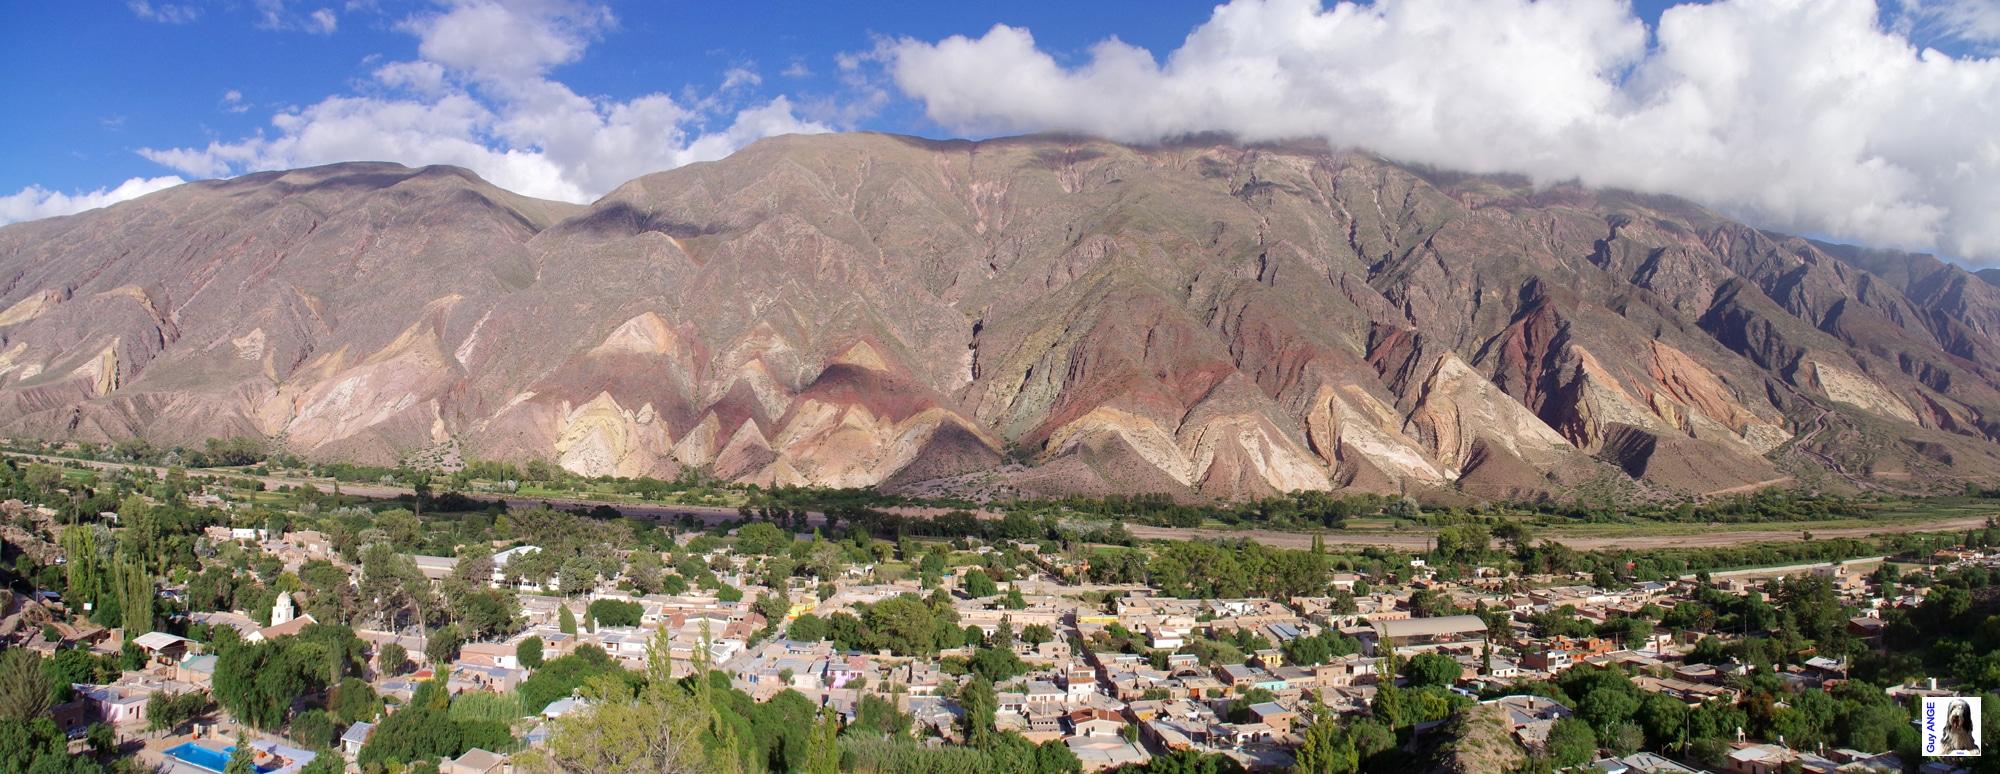 La Quebrada humahuaca.